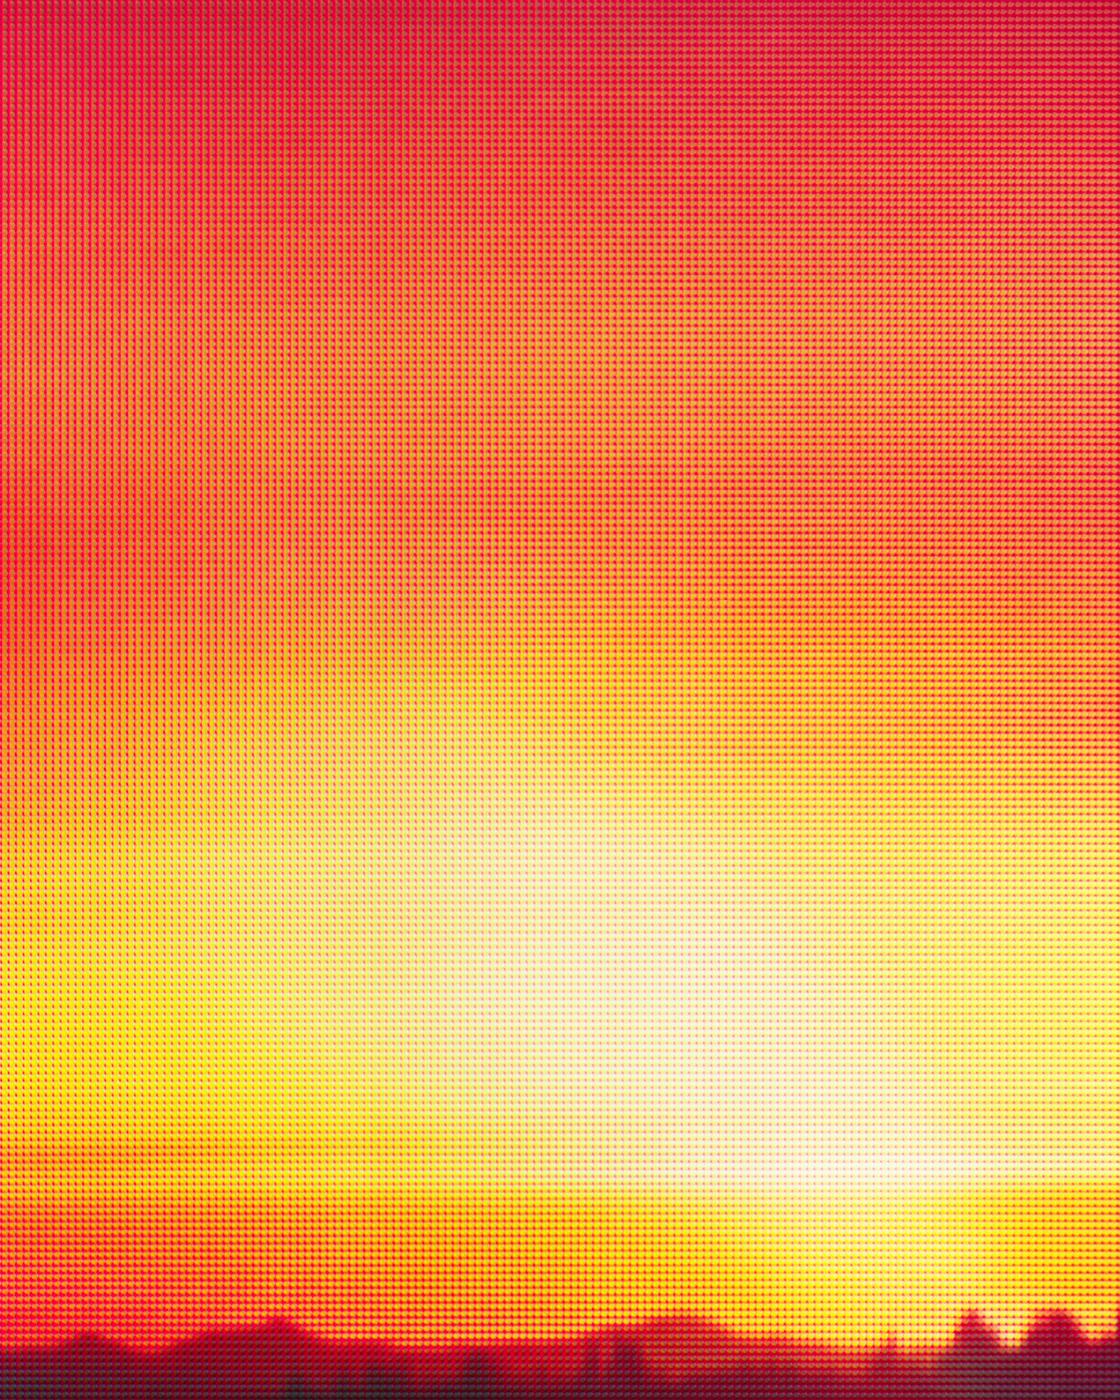 sg_sunset_06.jpg